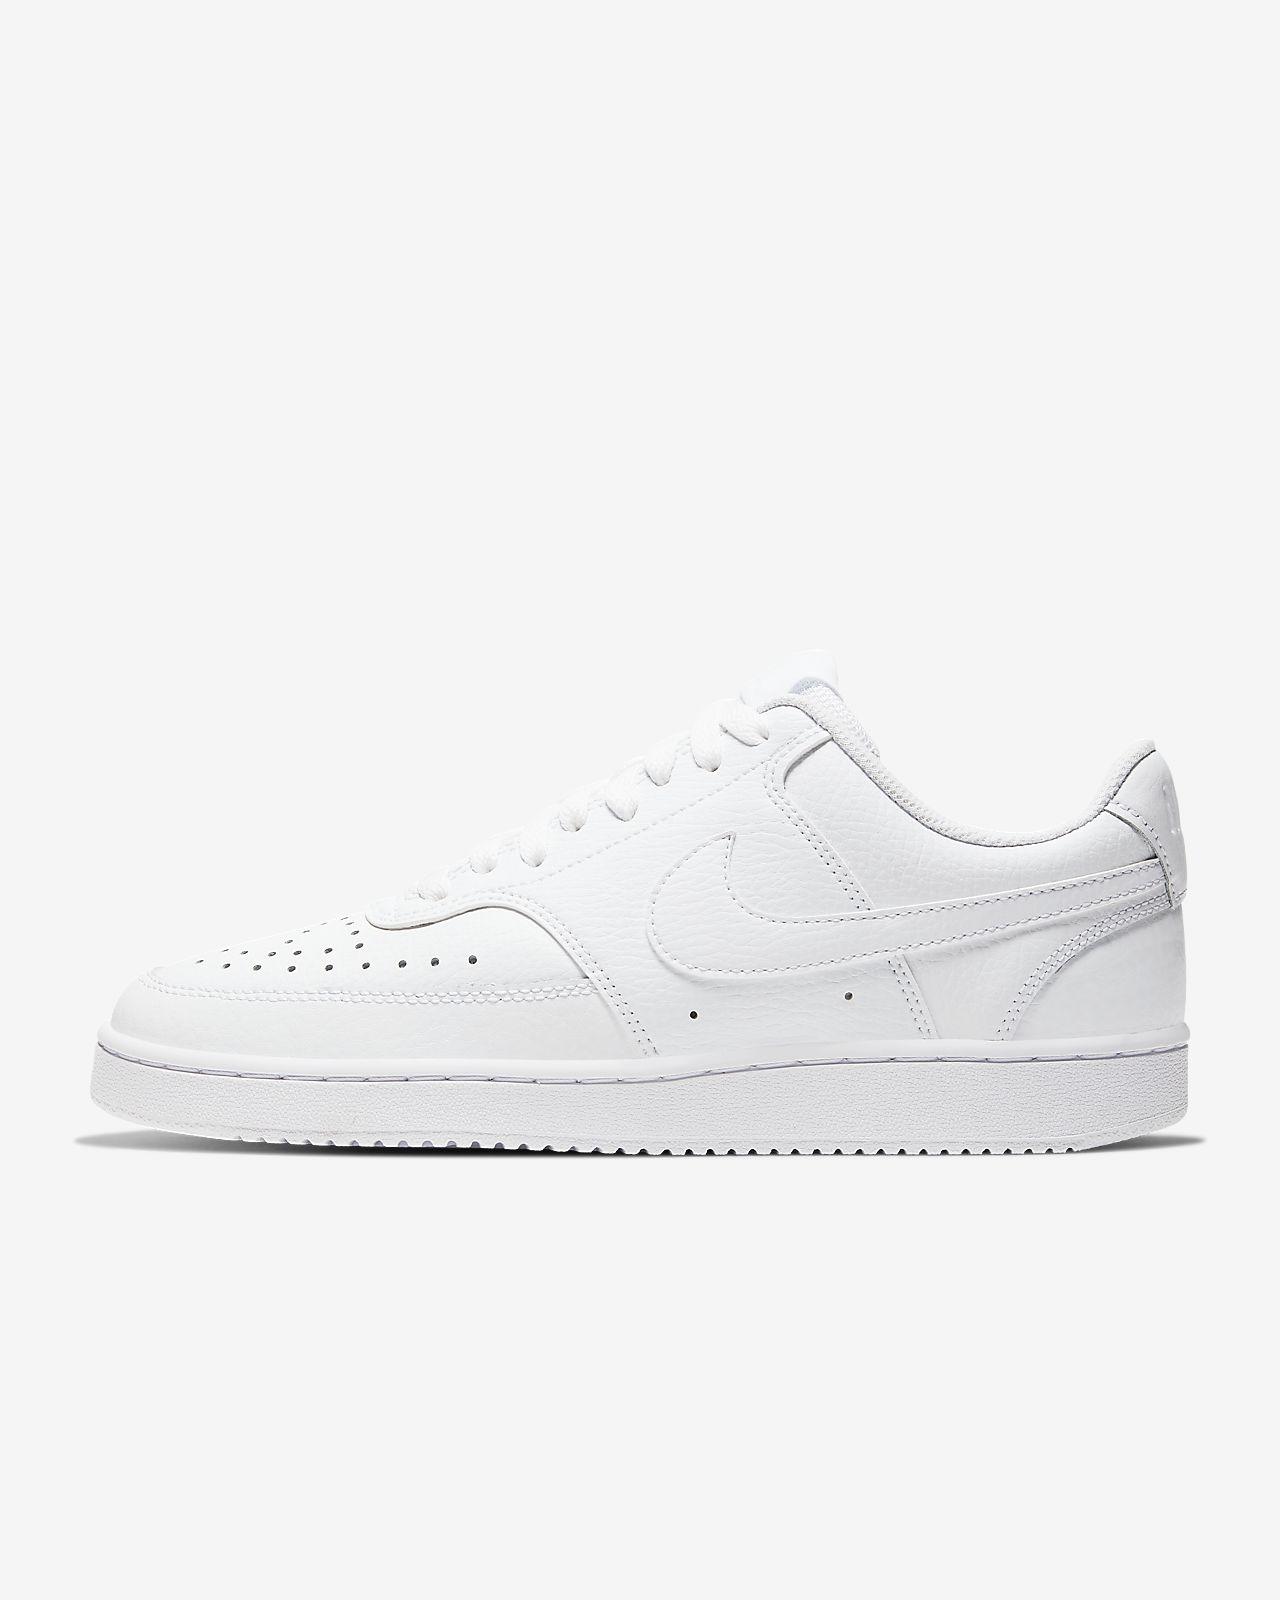 Chaussure Nike Court Vision Low pour Femme